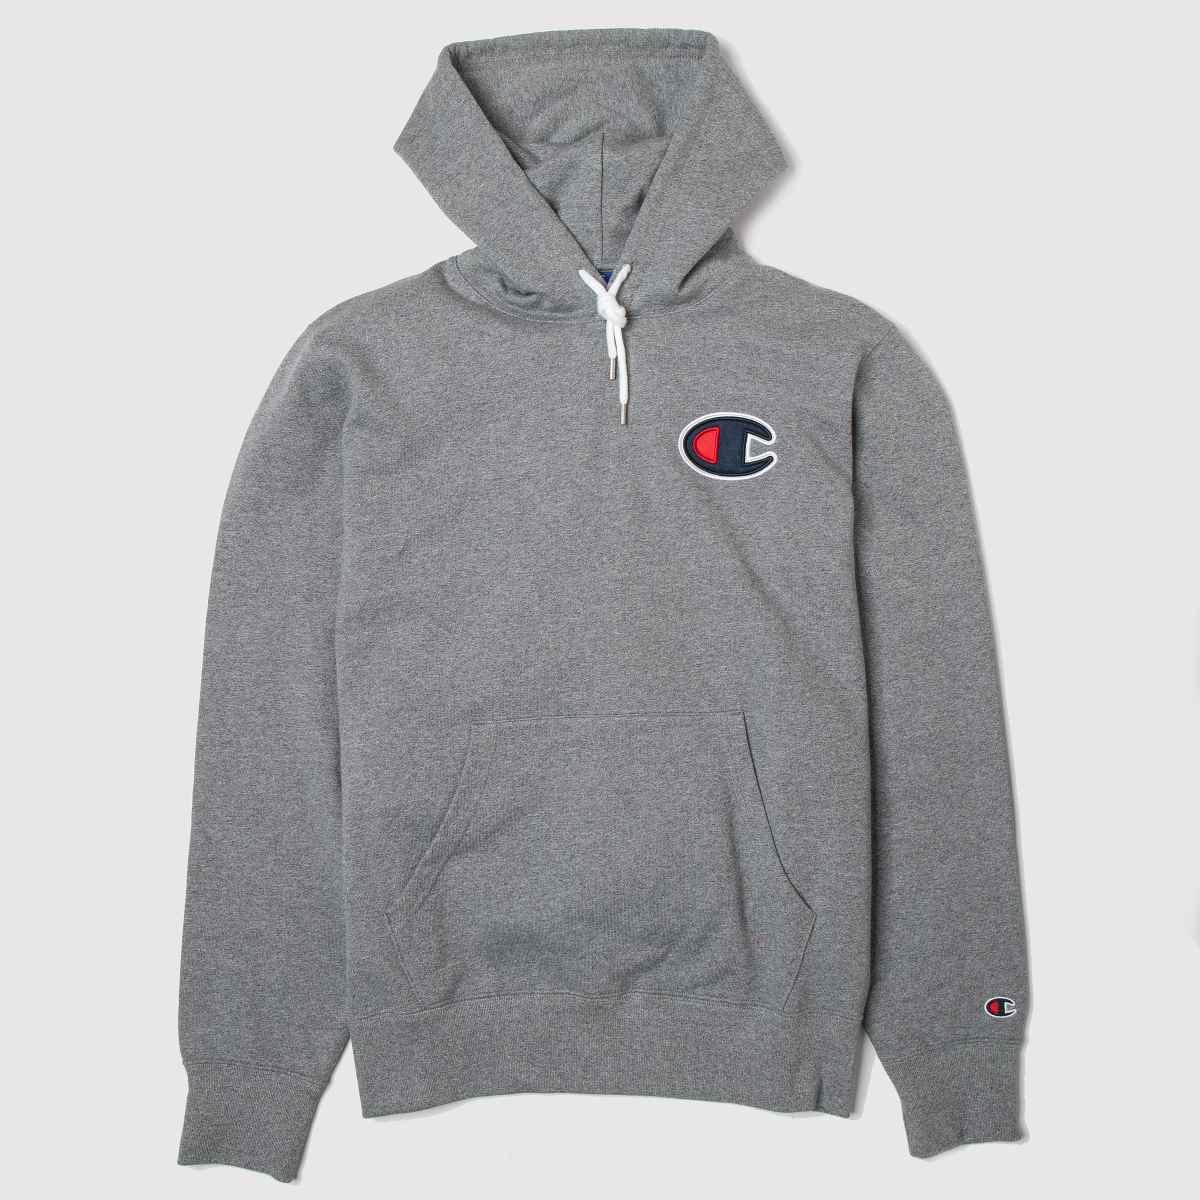 Champion Clothing Champion Grey Hooded Sweatshirt